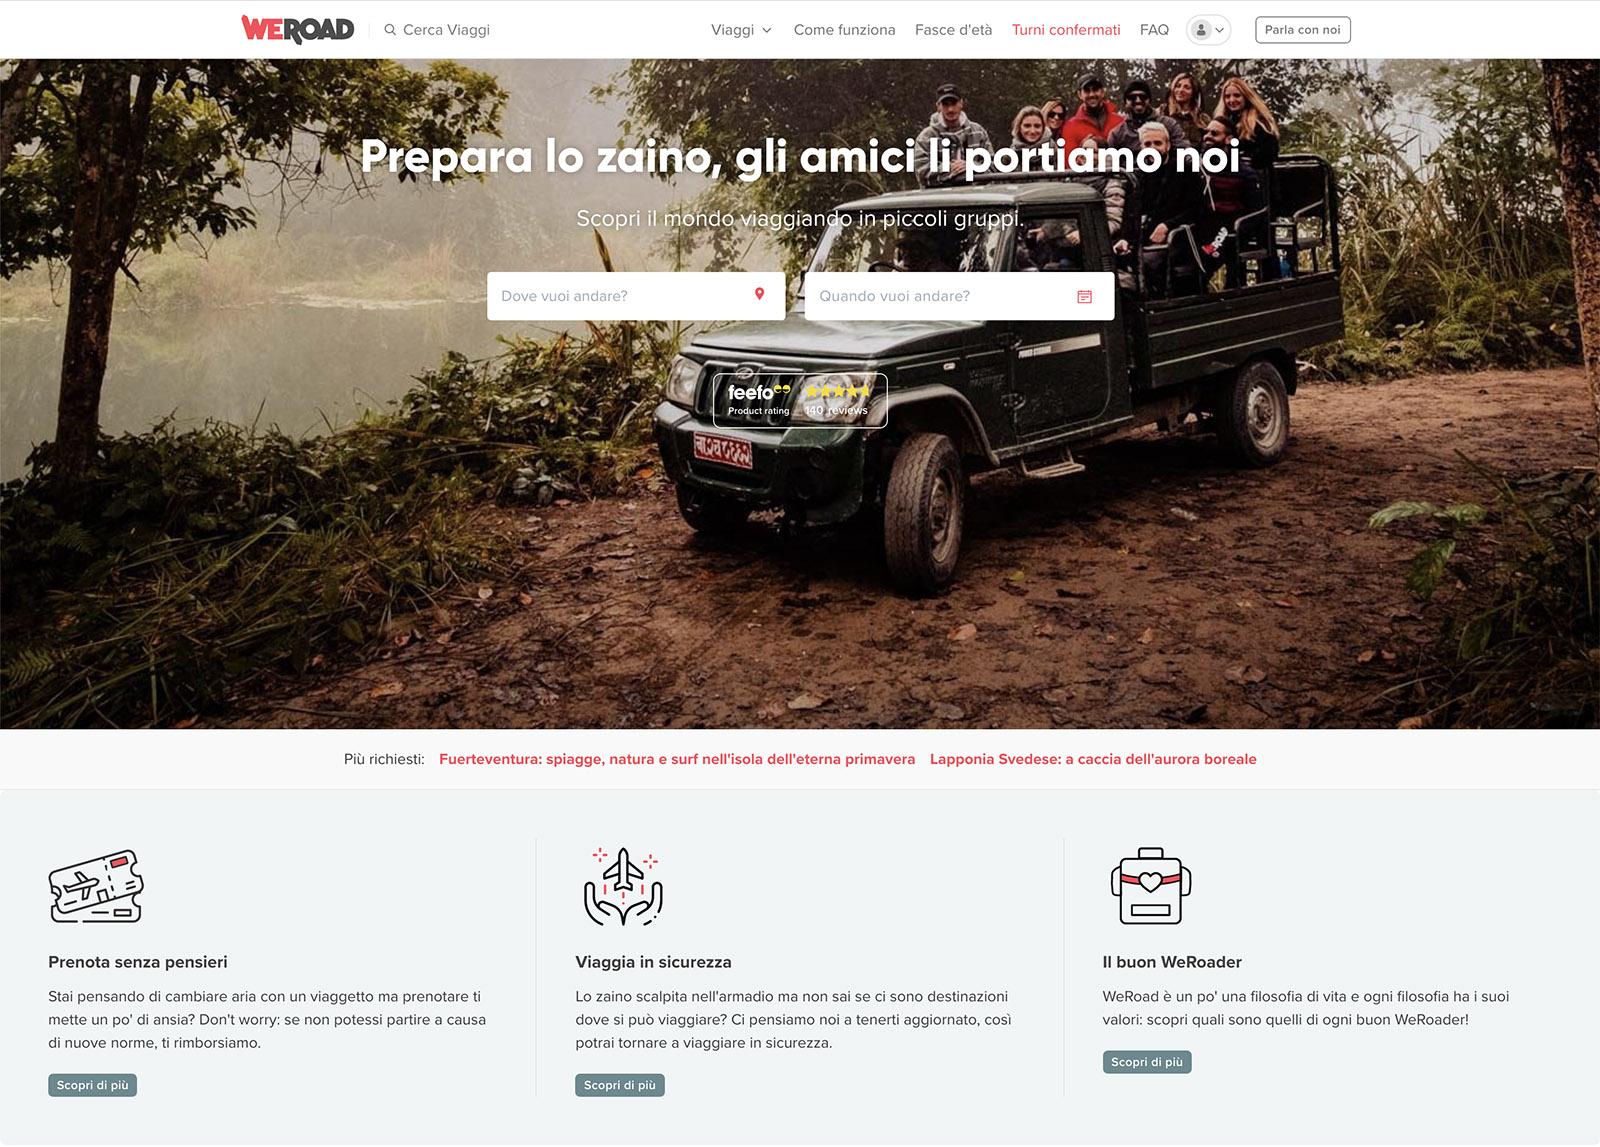 weroad landing page website